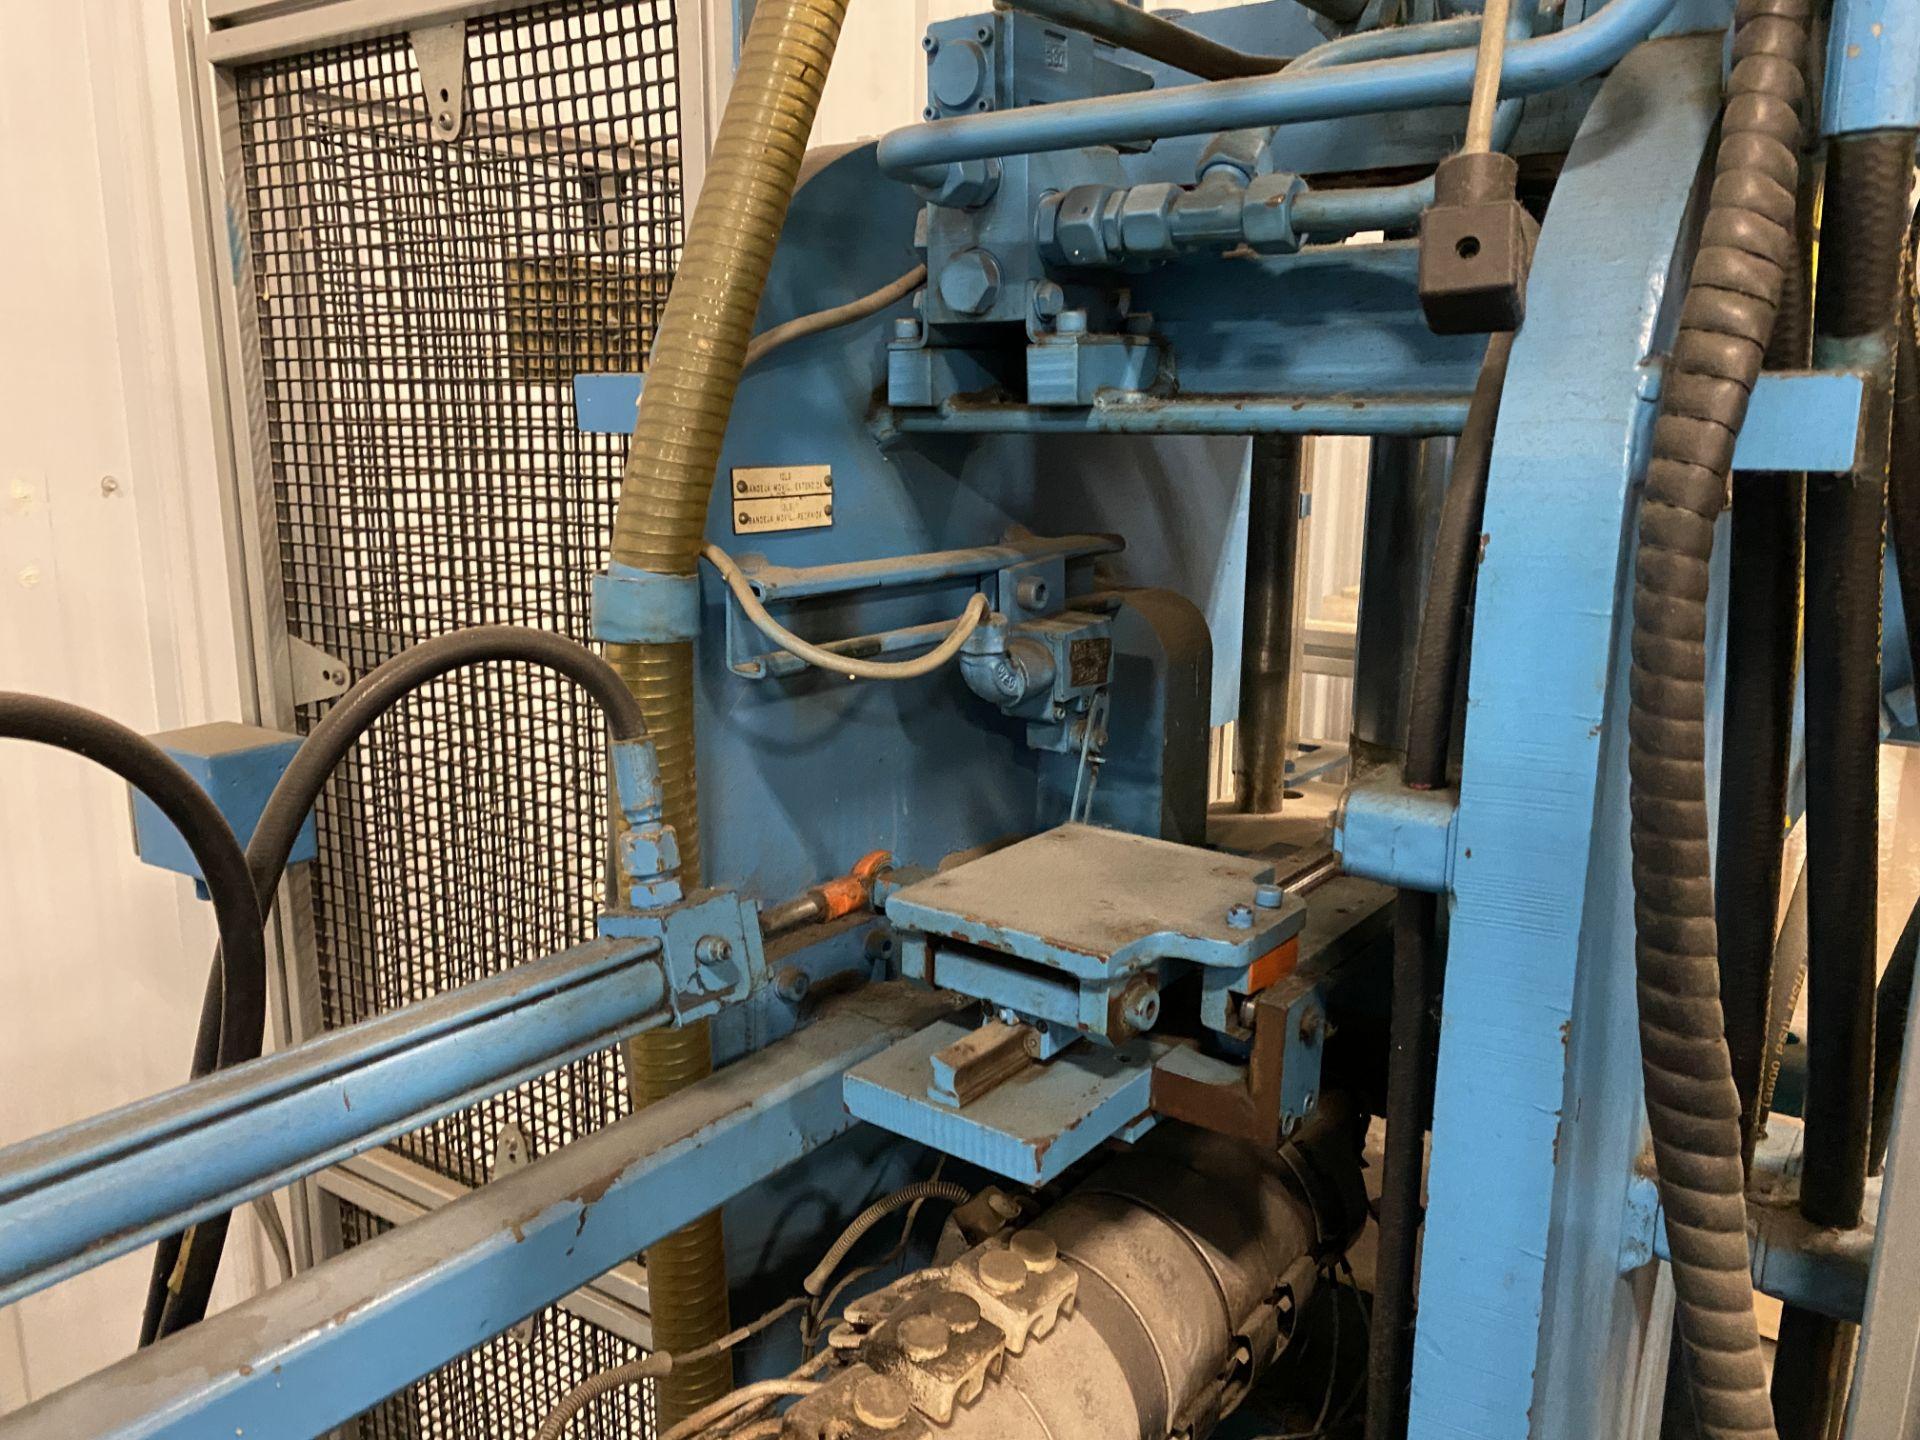 1998 PH Trueblood 42 Ton Plastic Injection Mold Machine - Image 6 of 13